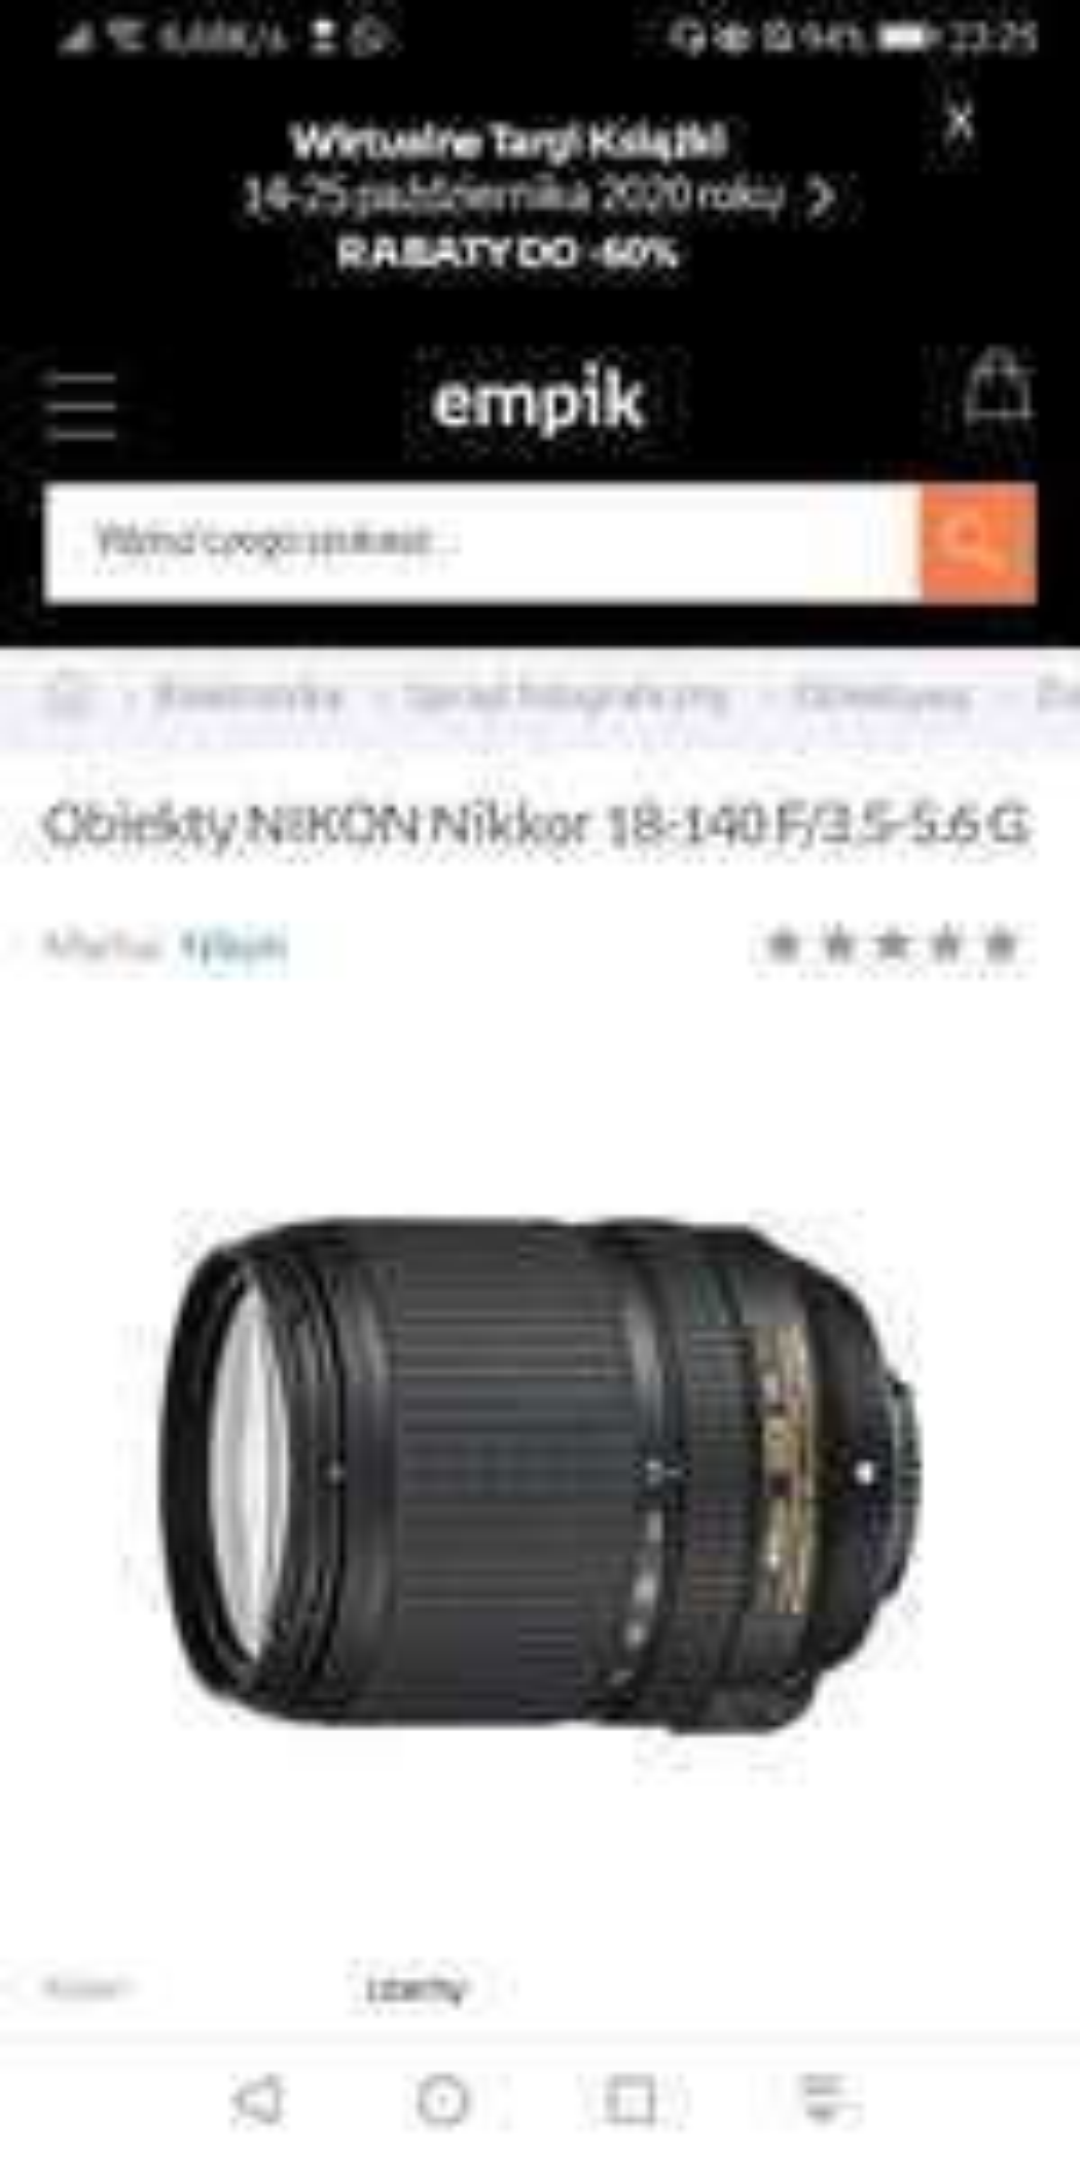 NIKON Nikkor 18-140 F/3.5-5.6 G